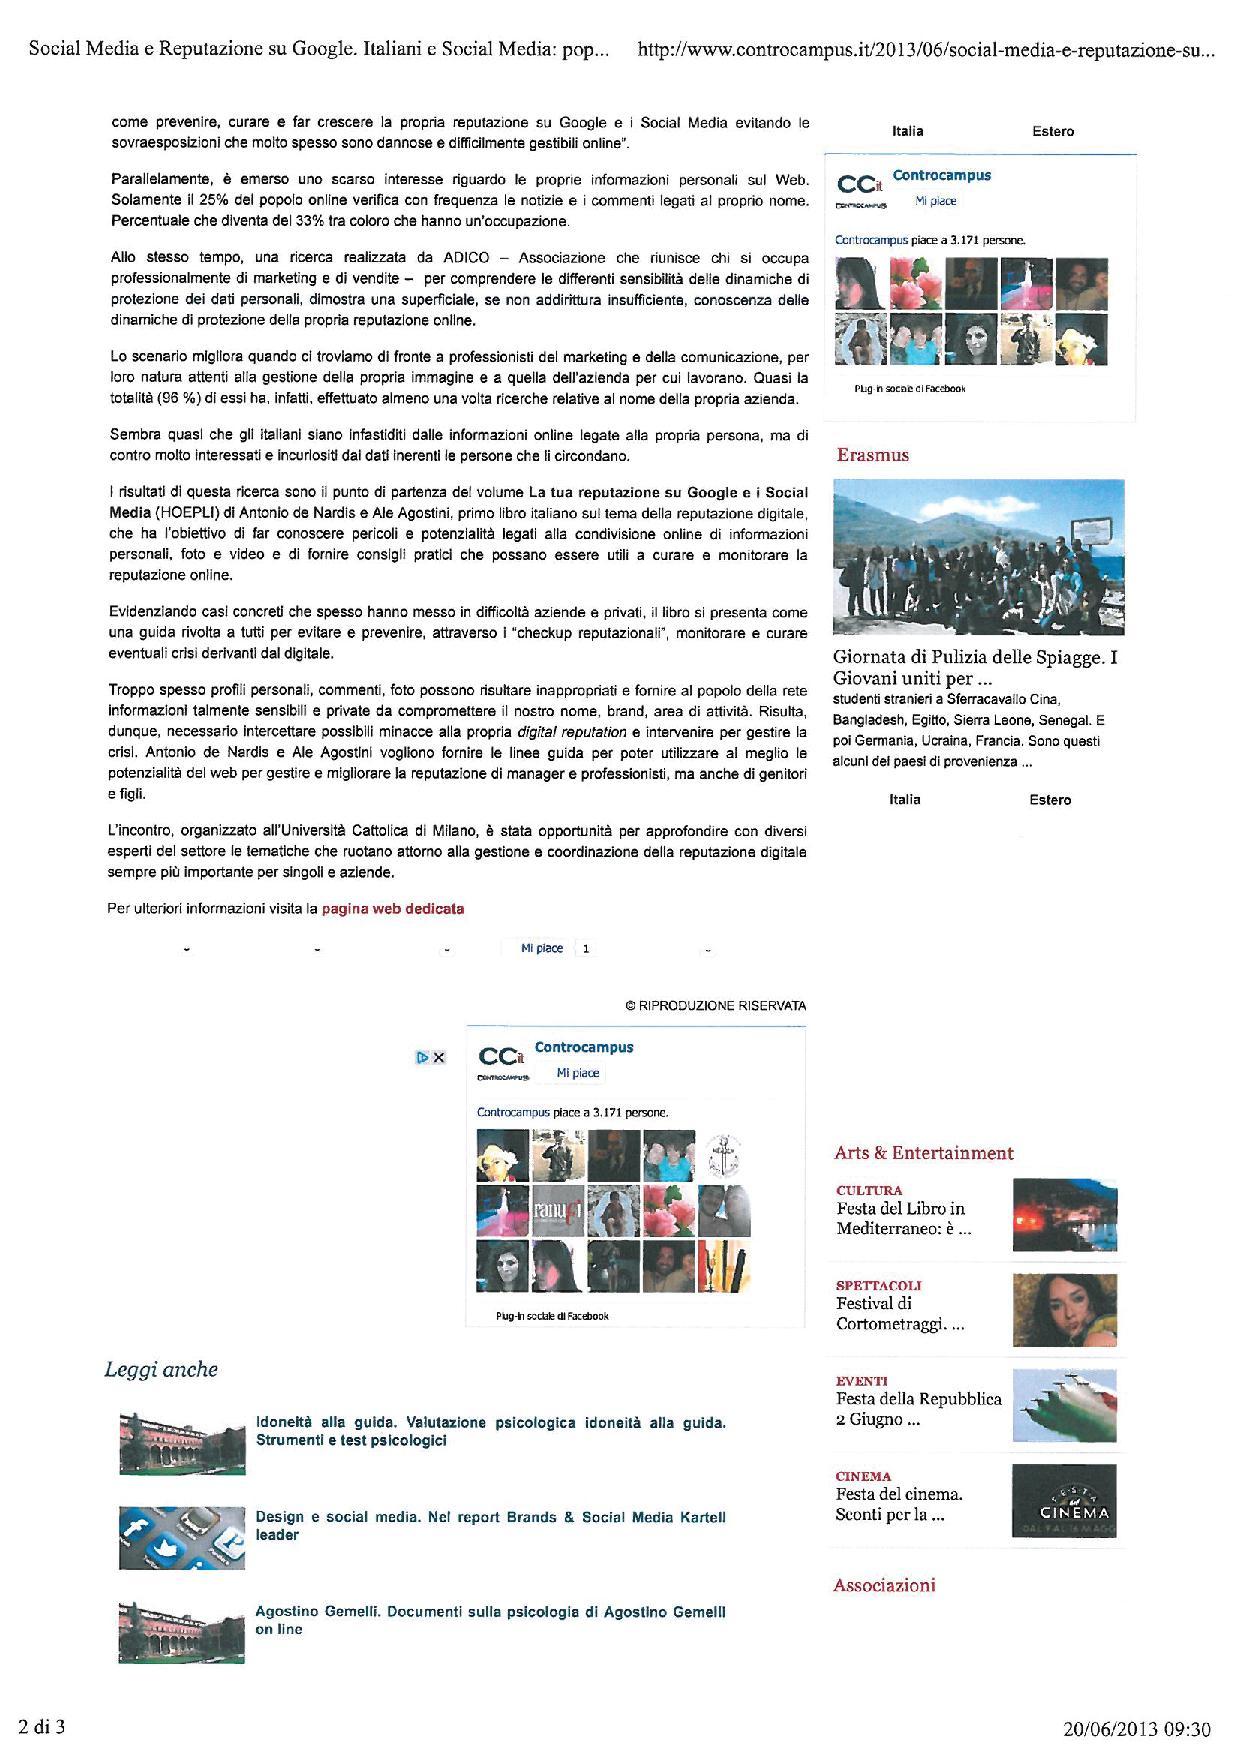 19.06.2013 Controcampus.it.pdf-002